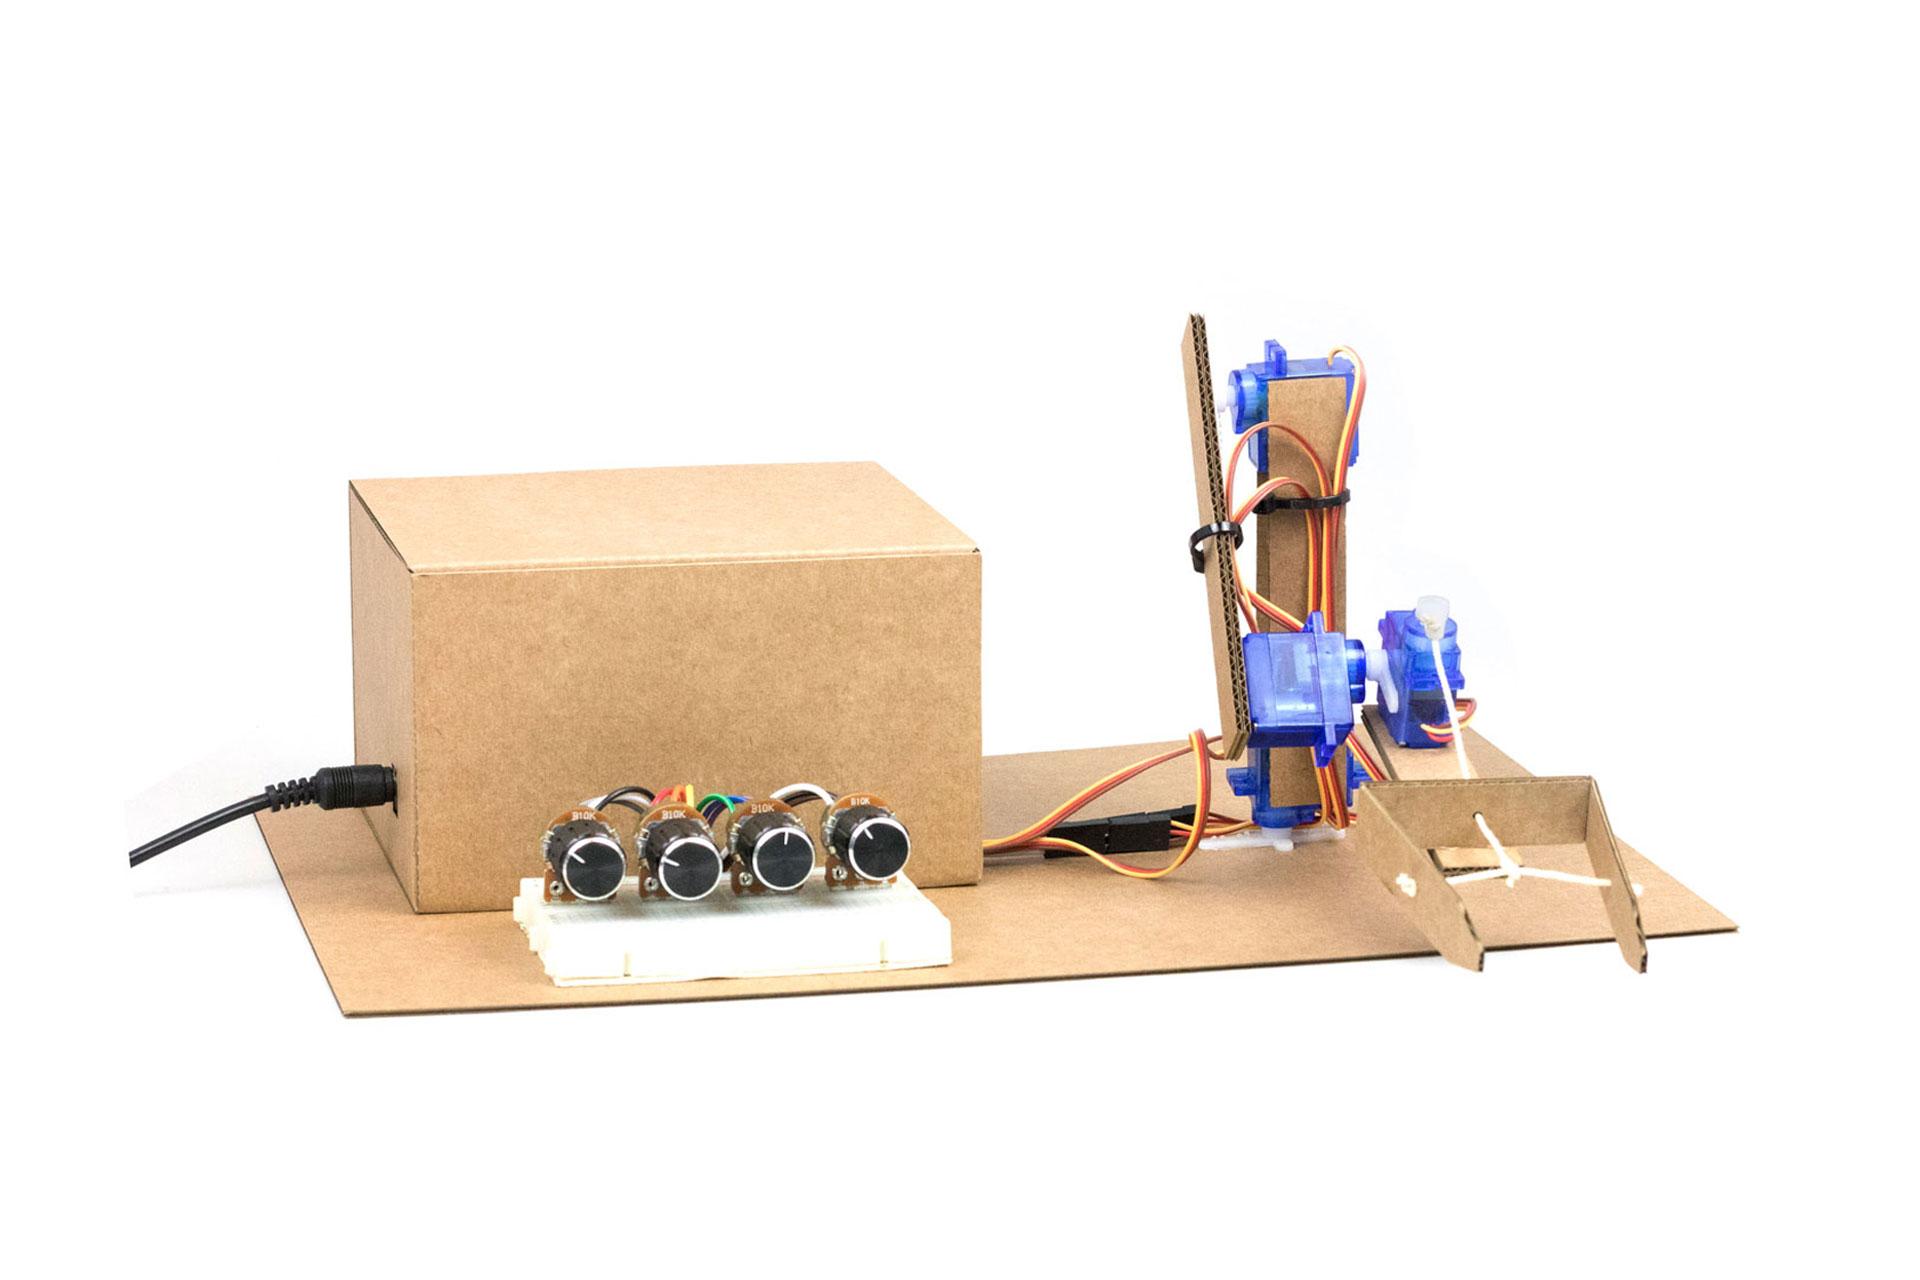 brazo robótico arduino